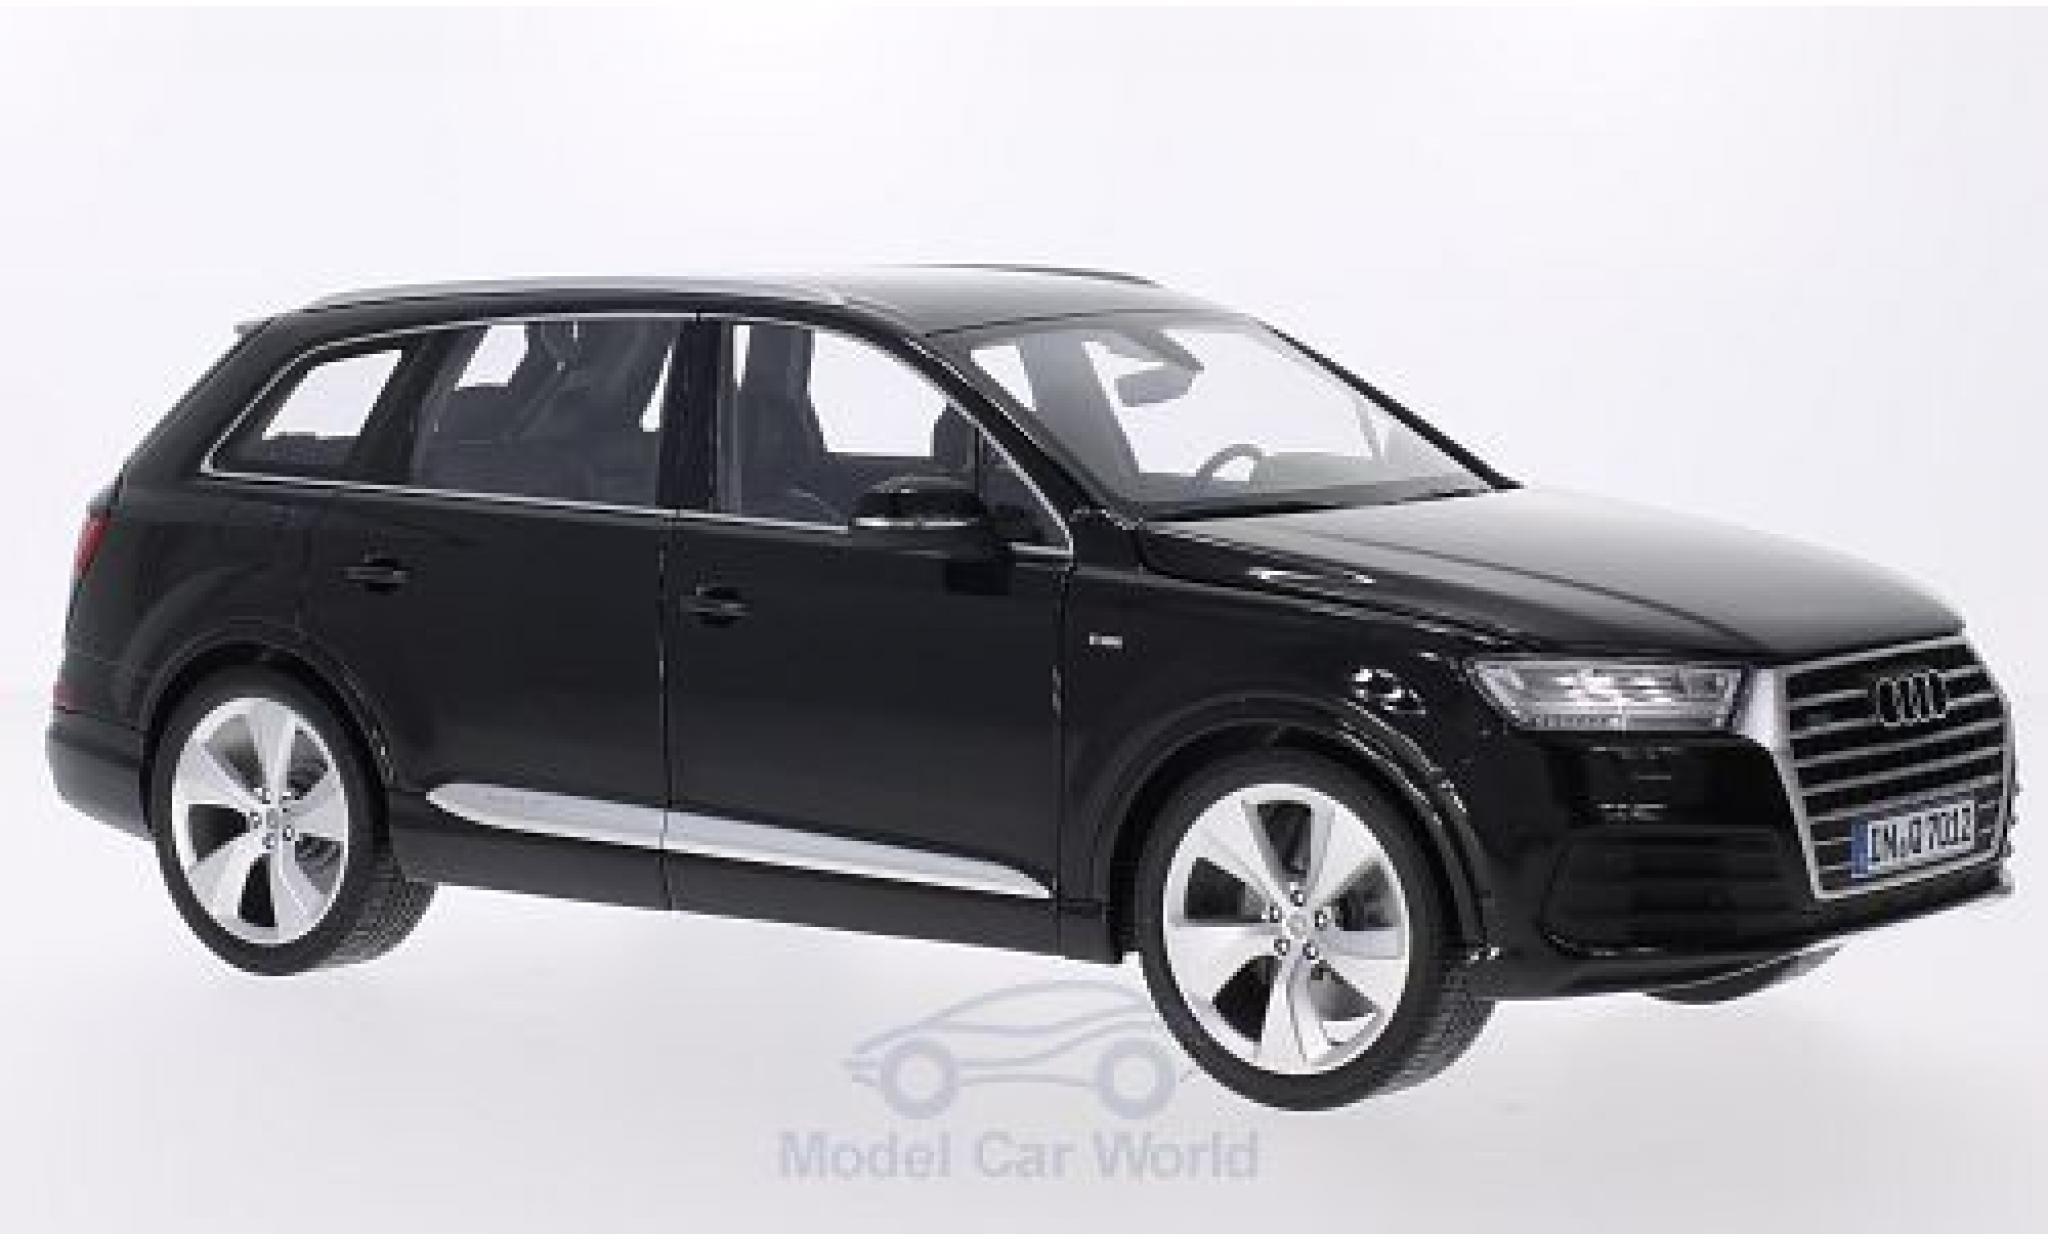 Audi Q7 1/18 Minichamps (4M) black